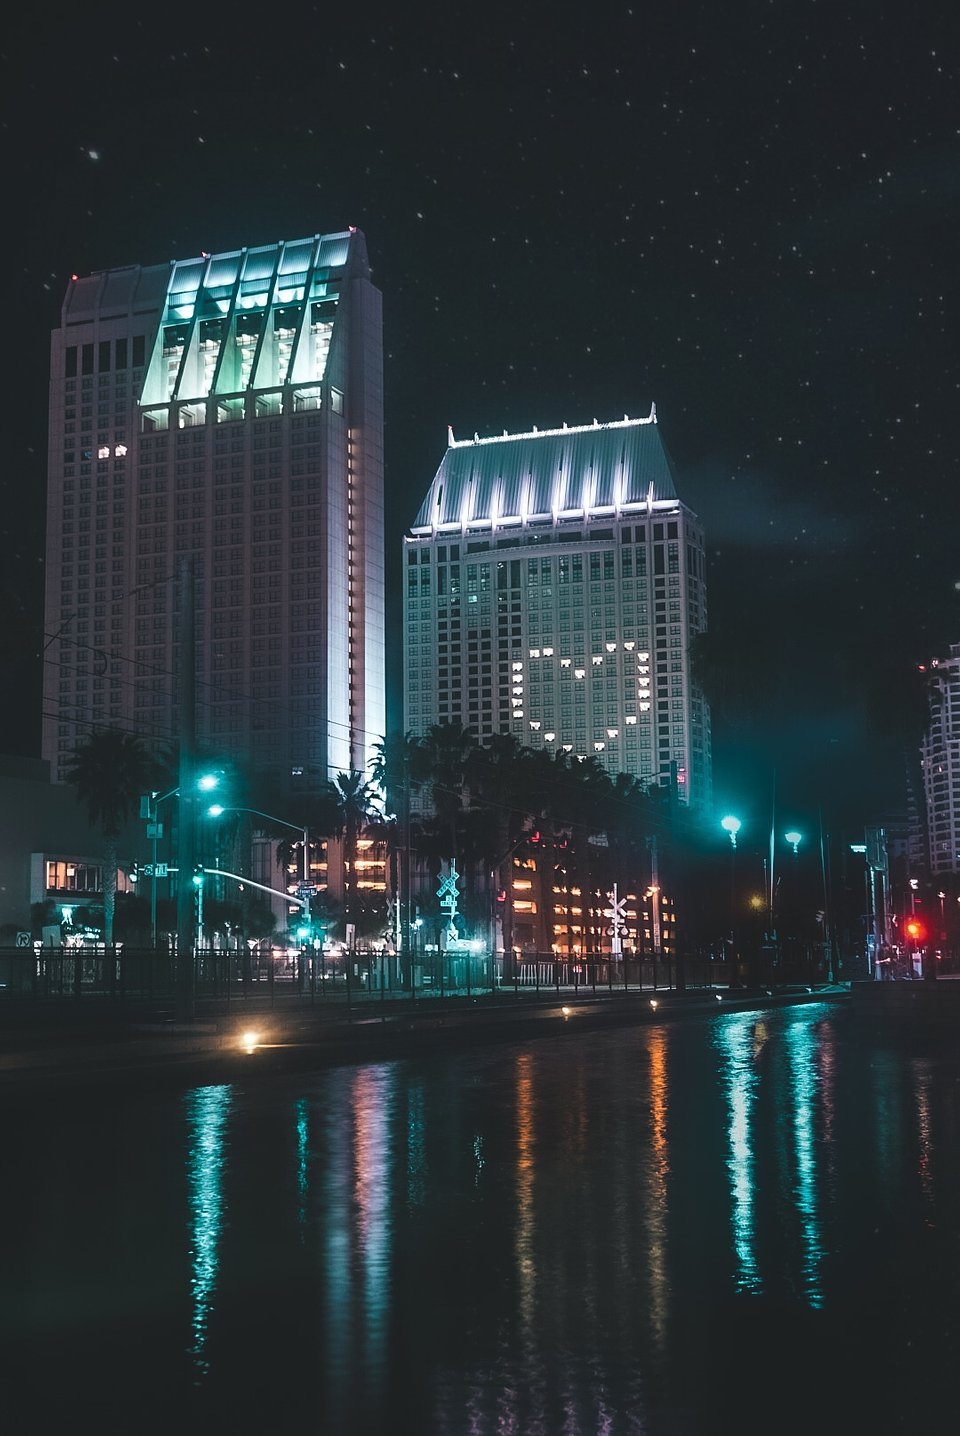 Location: San Diego, USA